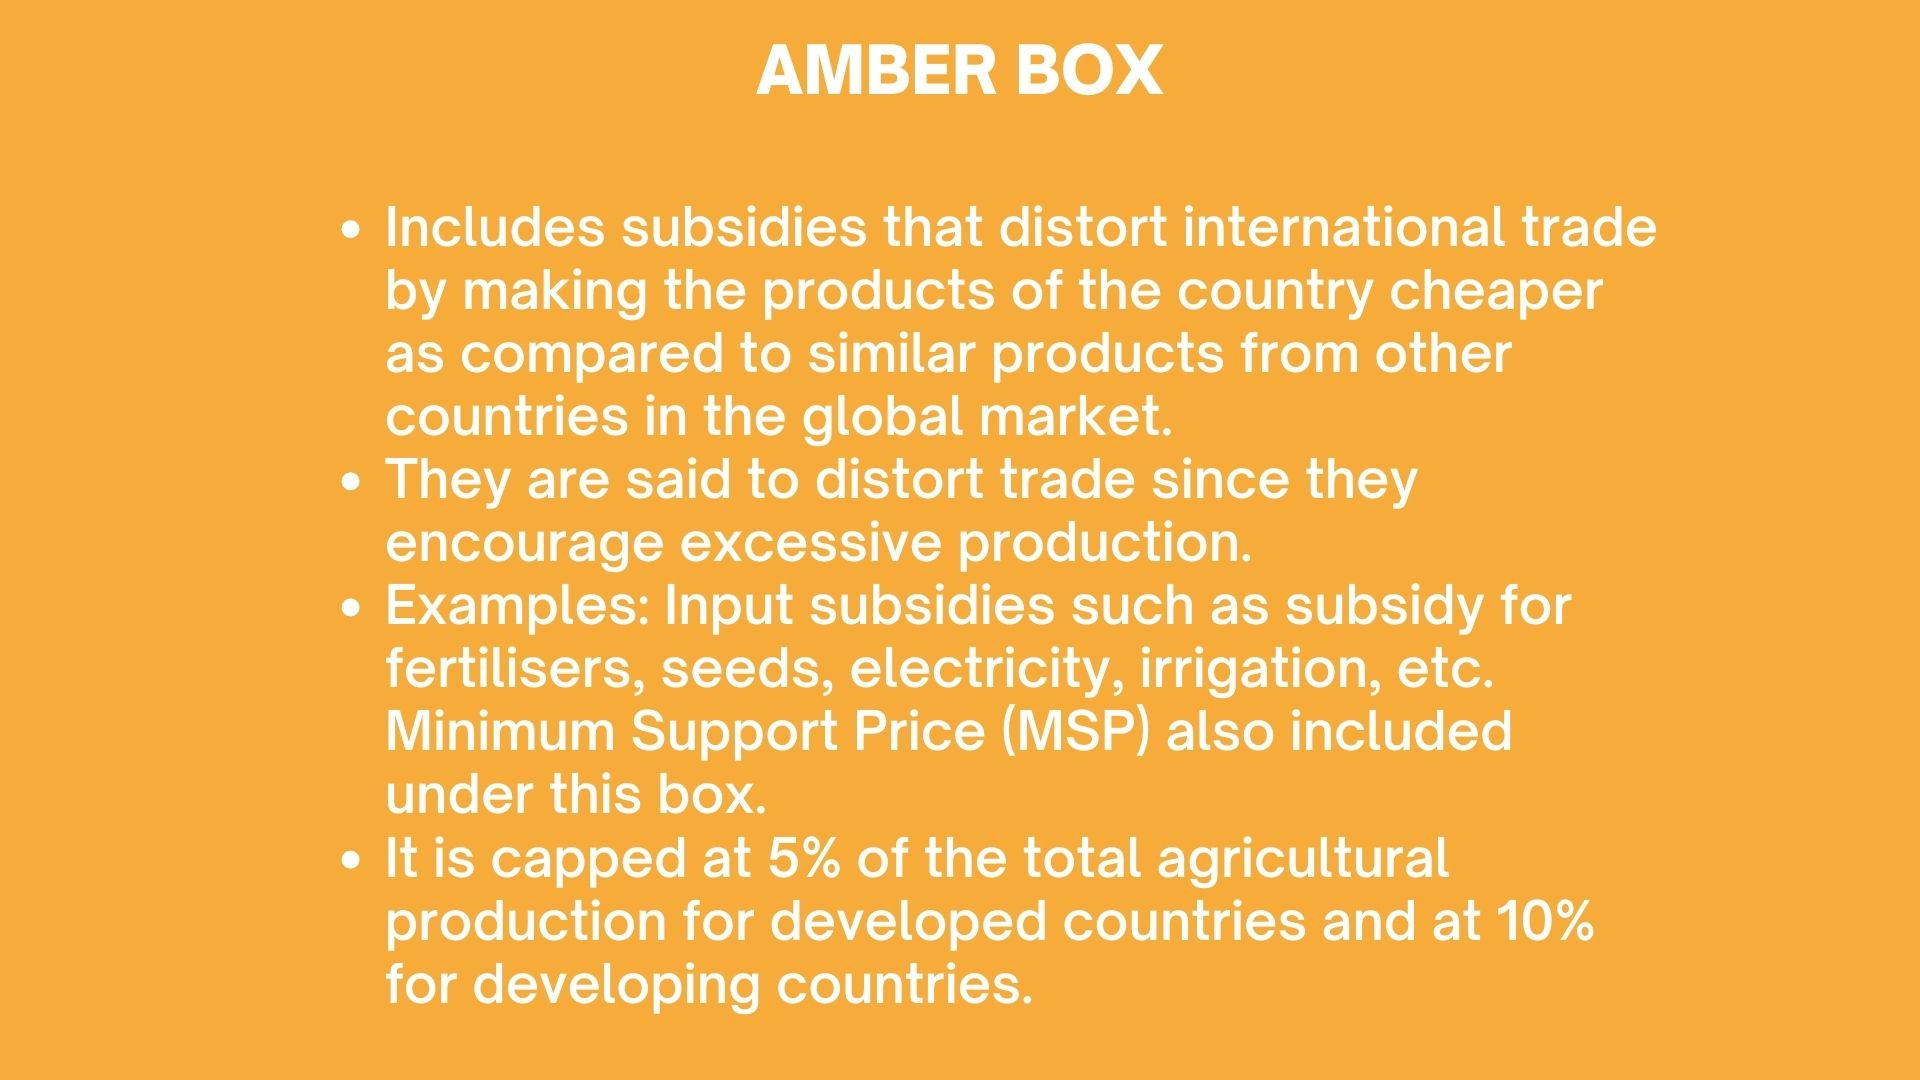 WTO Amber Box